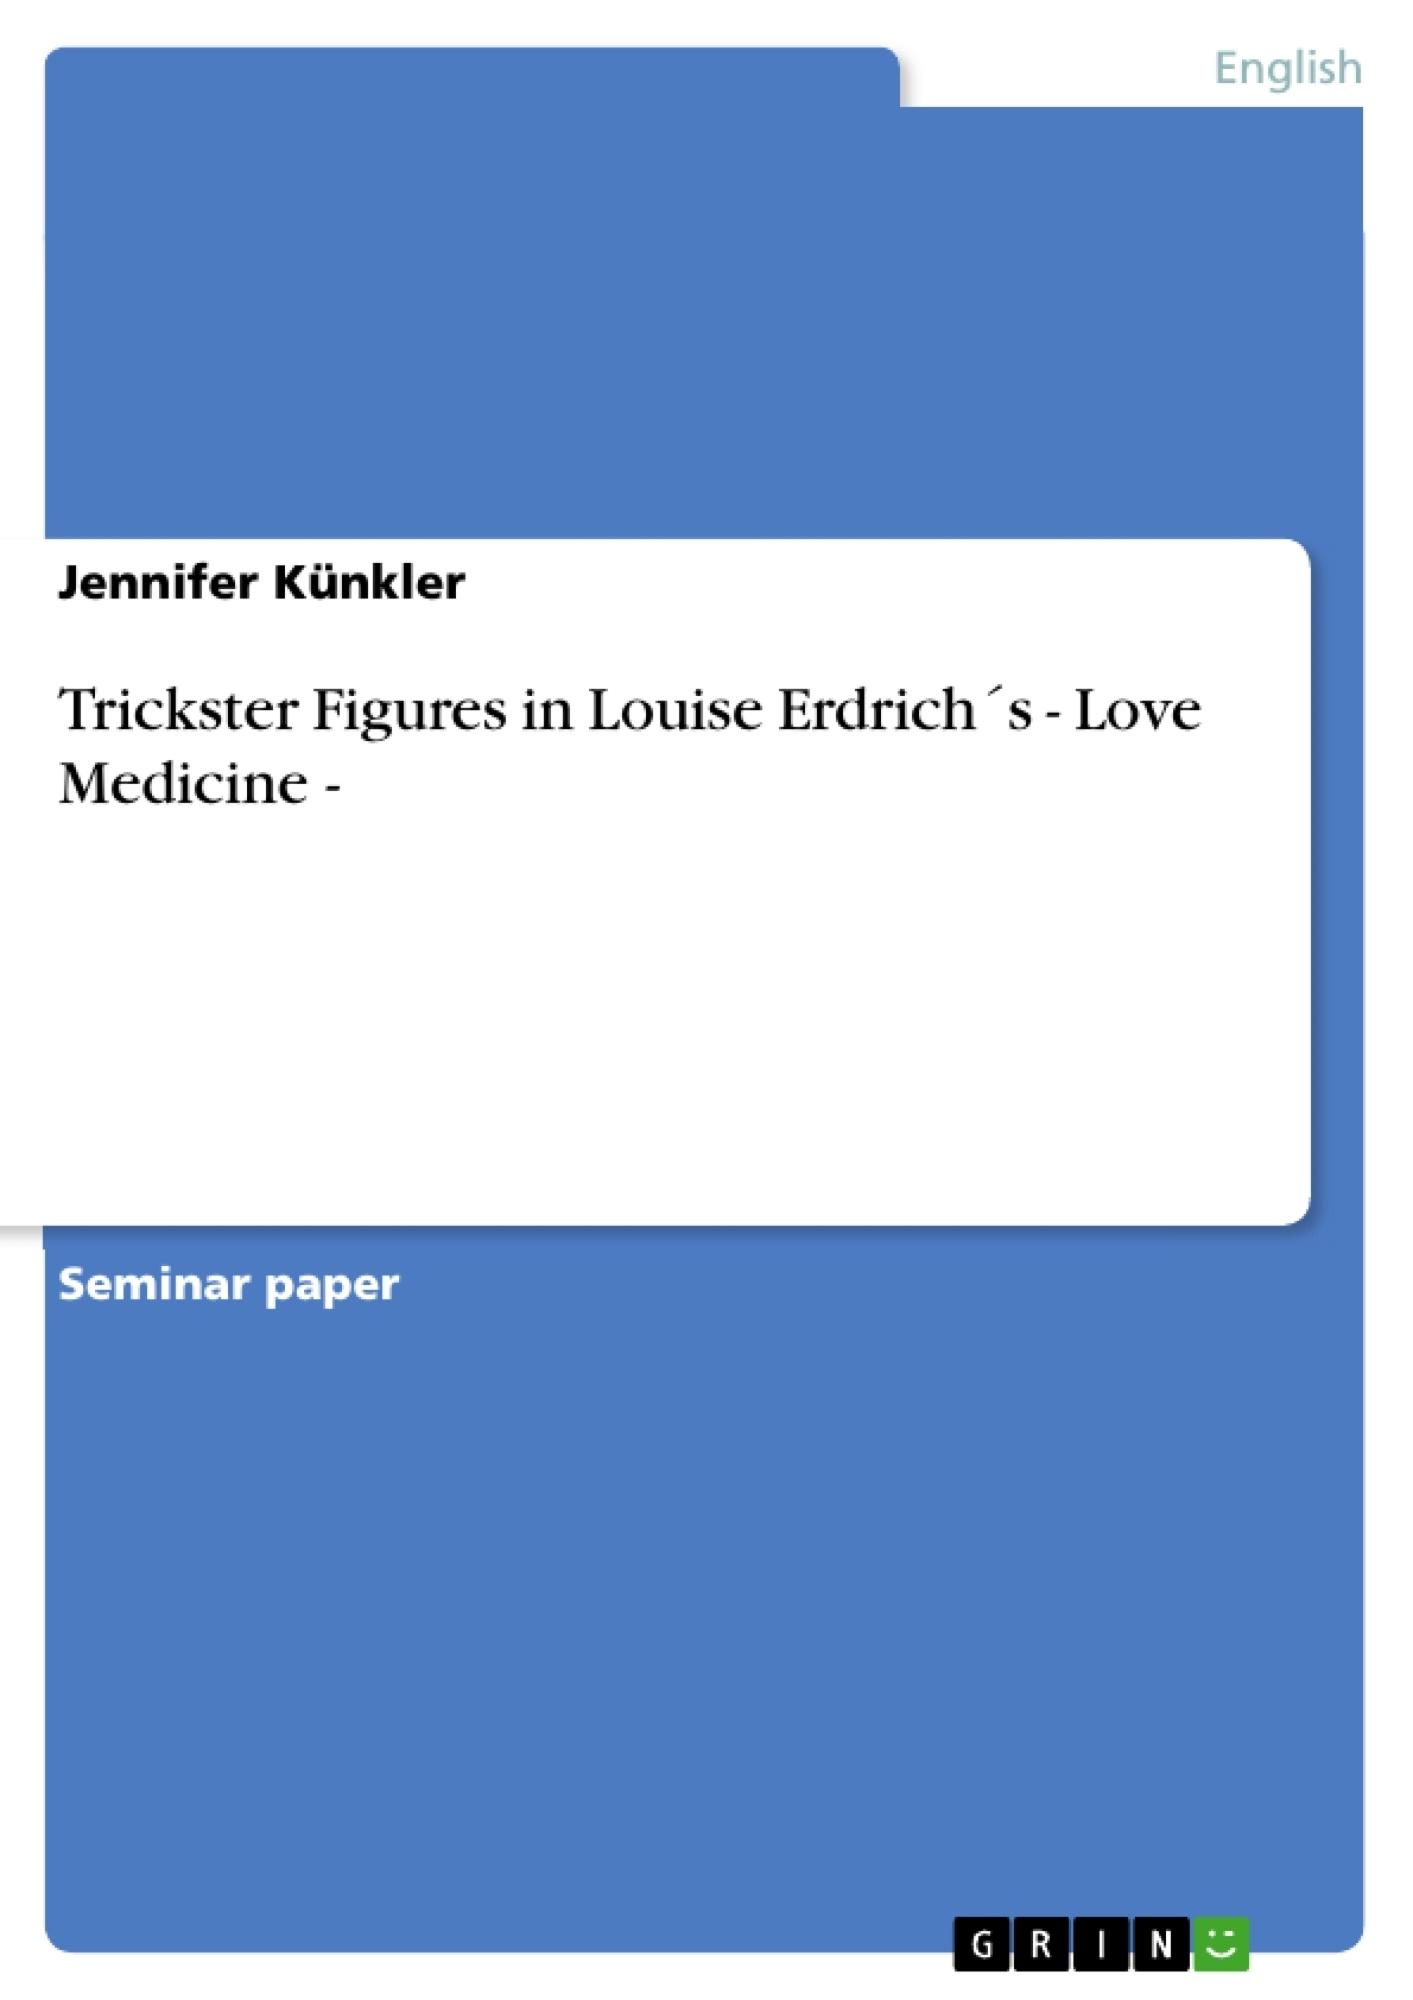 Title: Trickster Figures in Louise Erdrich´s - Love Medicine -